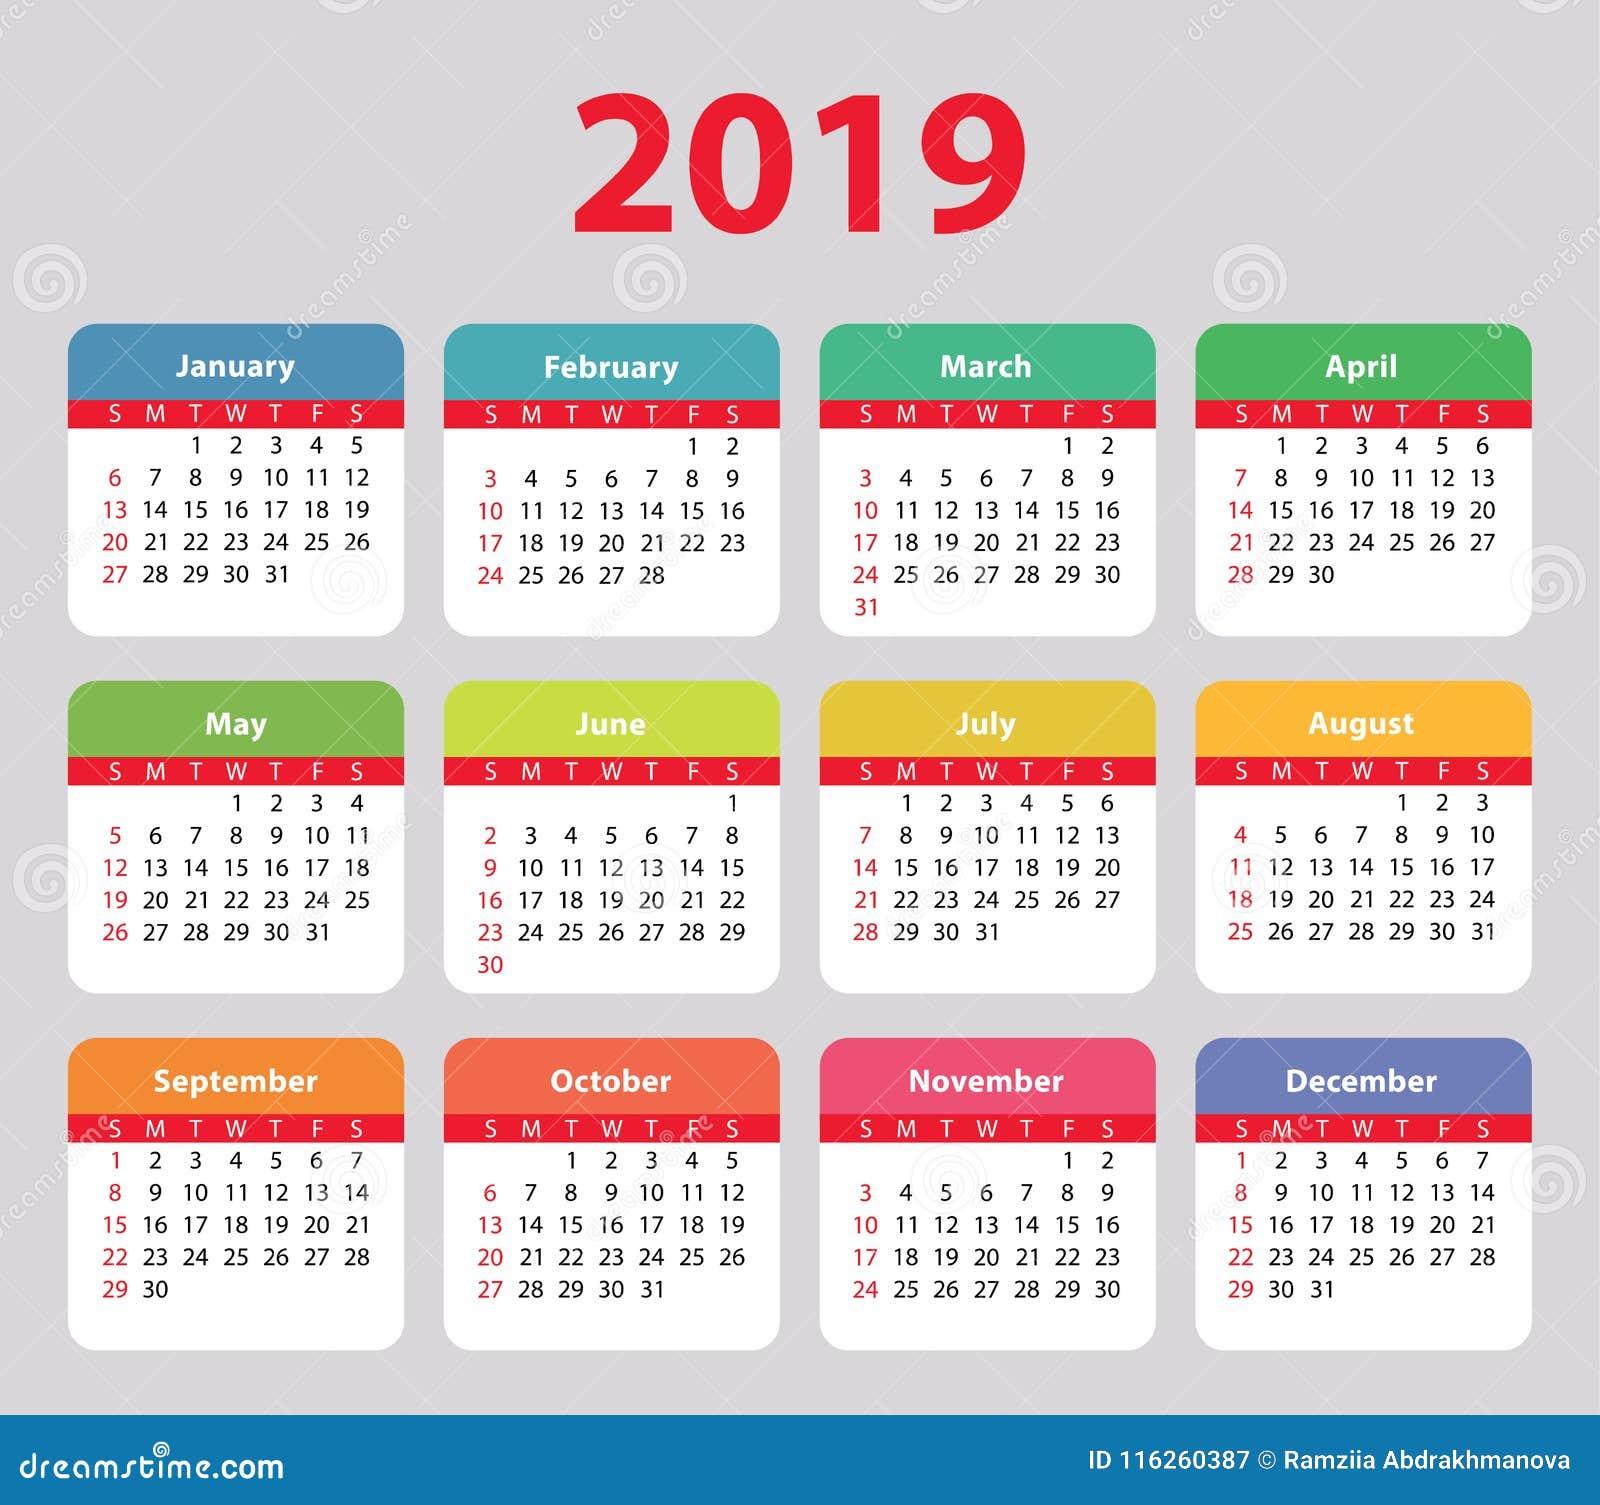 Calendrier Avril Mai Juin 2019.Calendrier 2019 La Semaine Commence Le Dimanche De Base